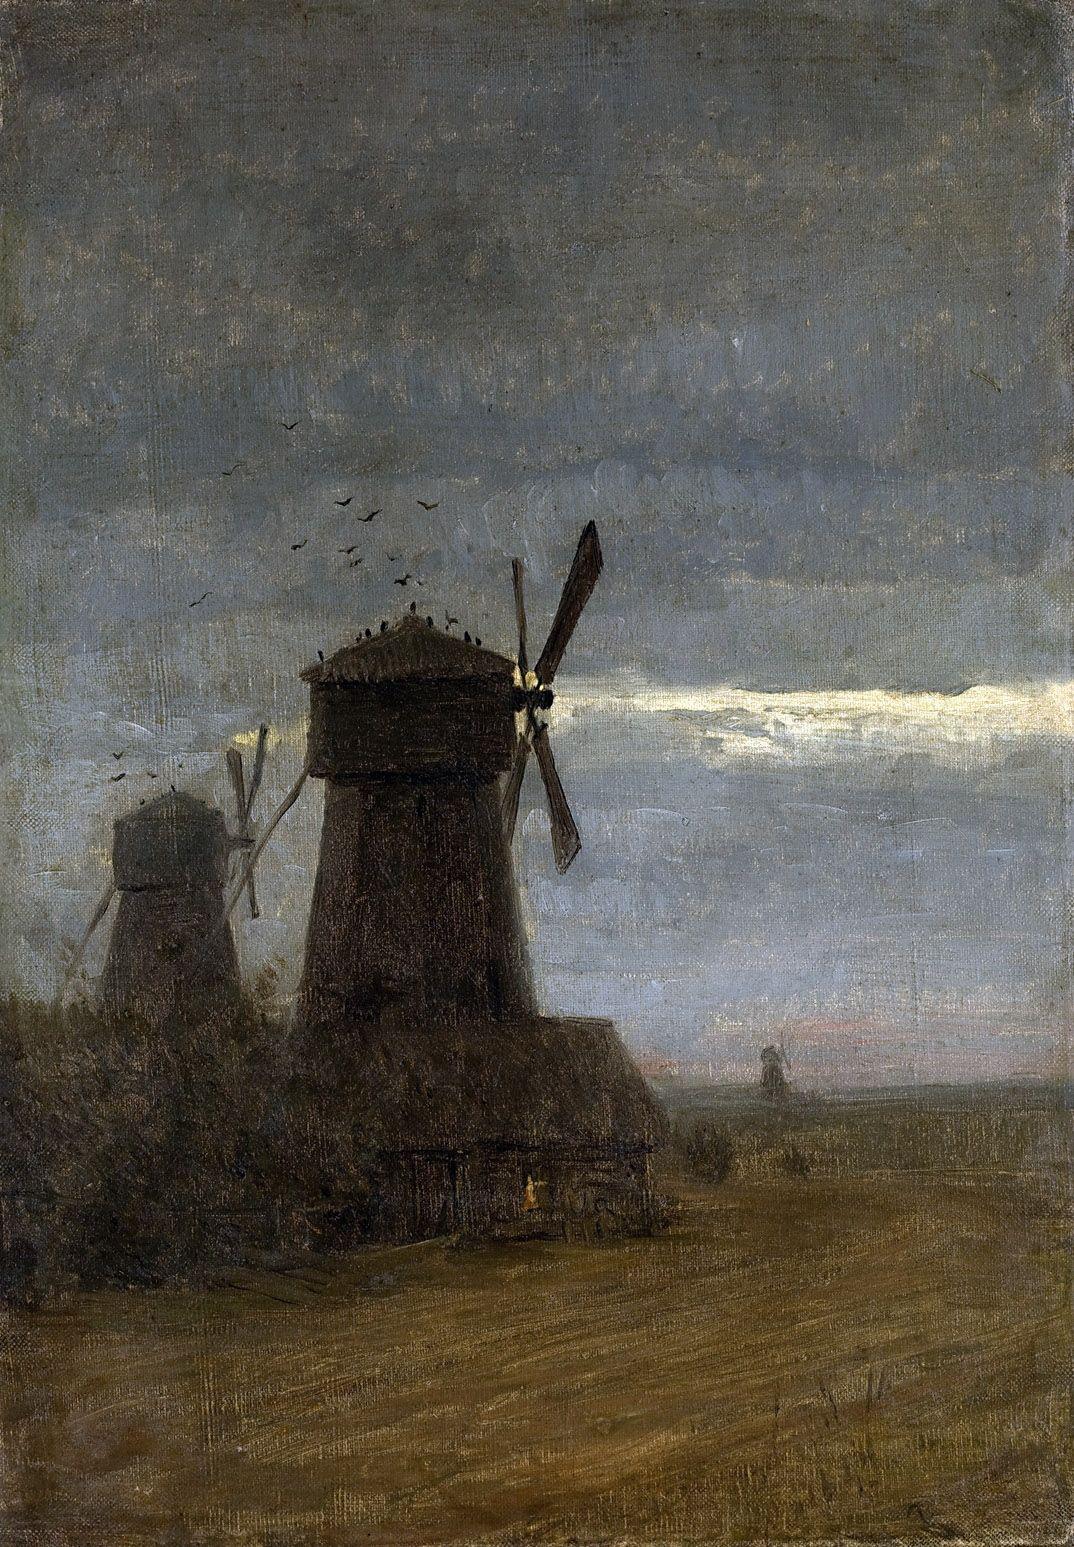 Isaac Levitan. Windmills. Late twilight